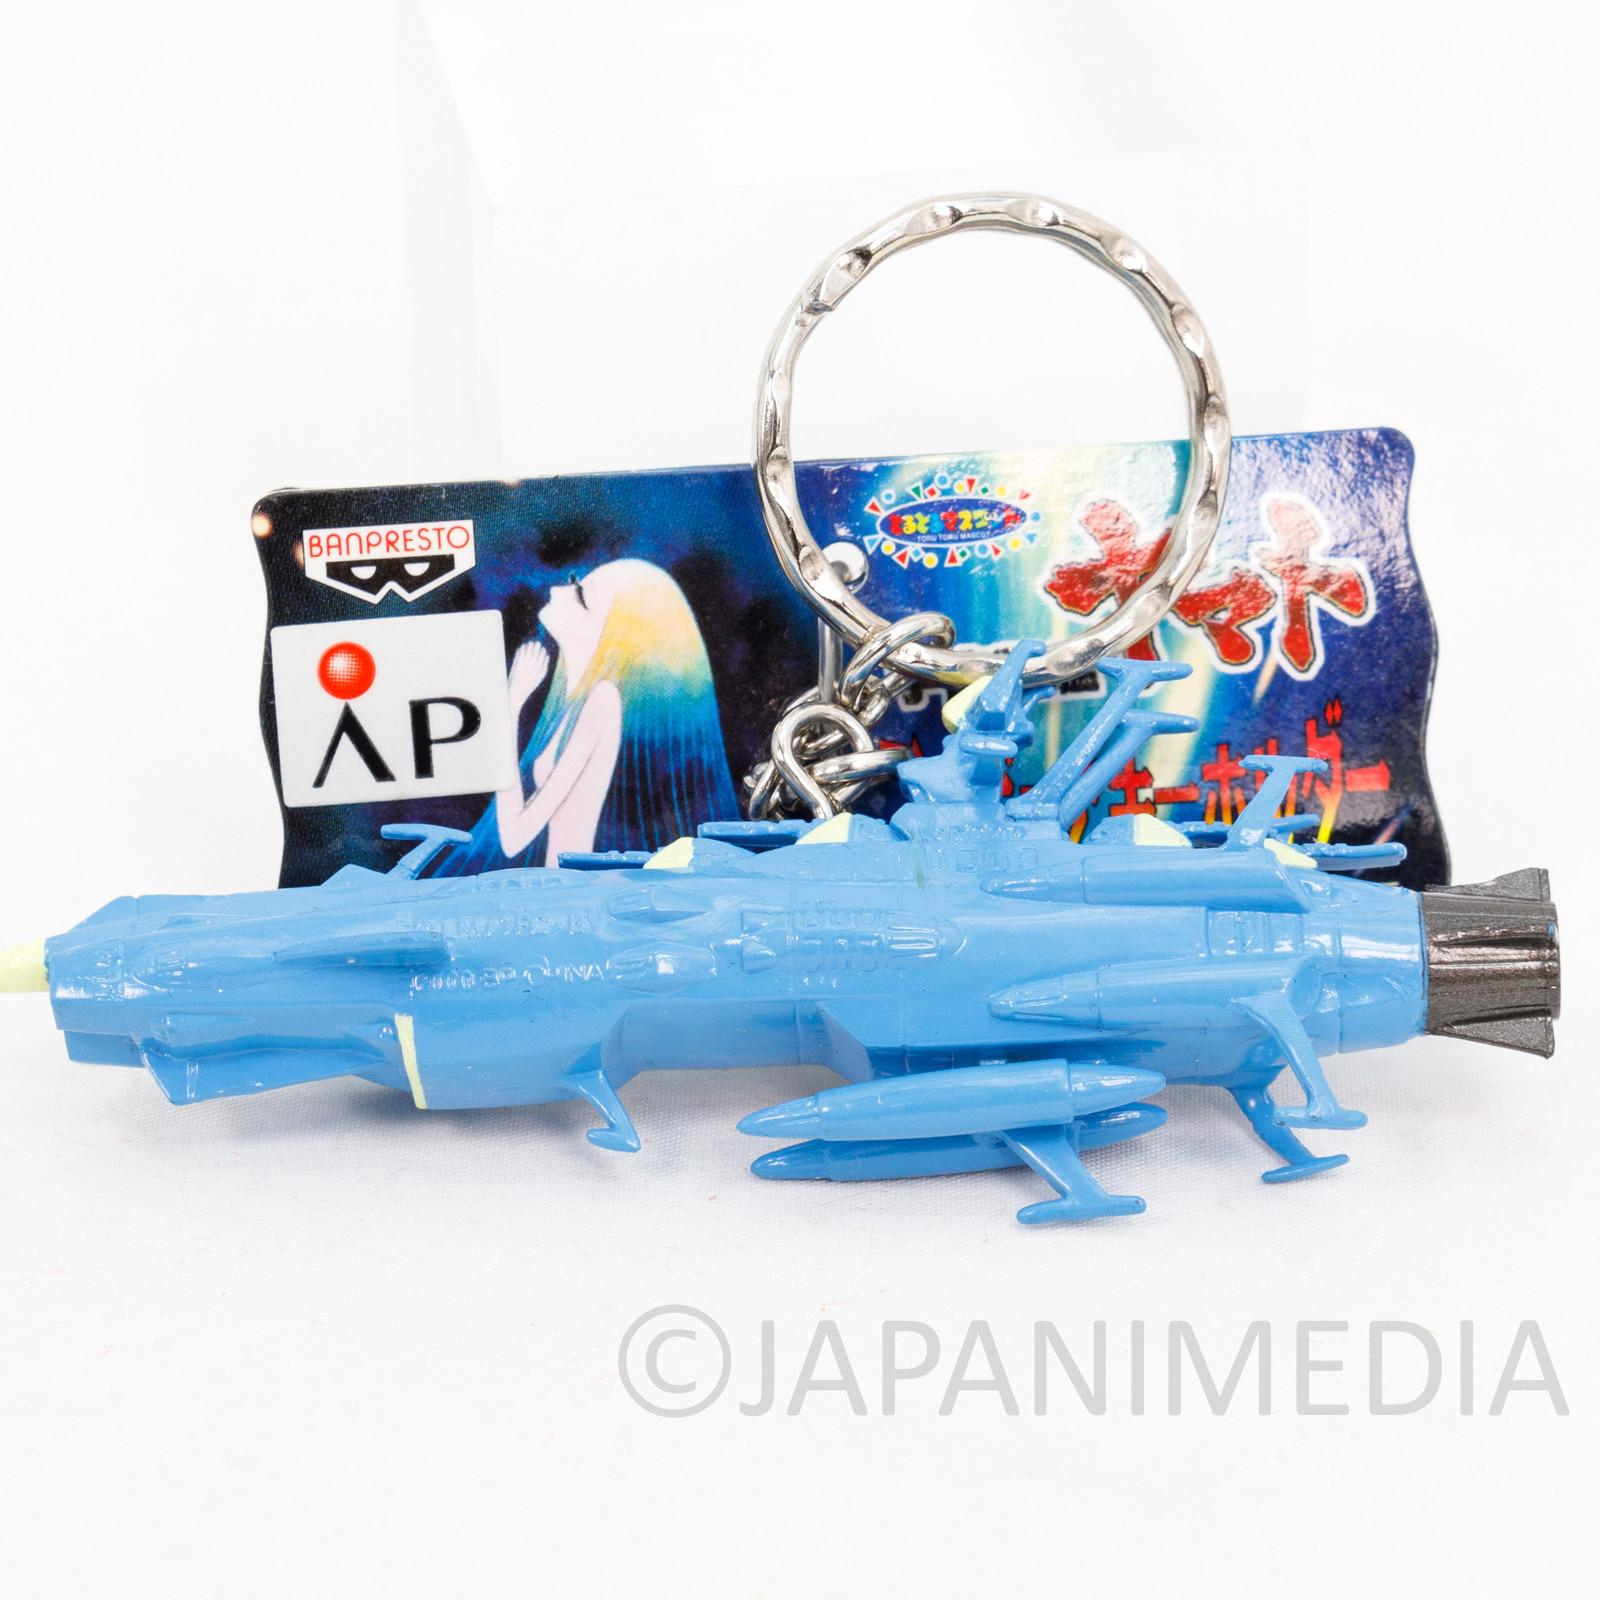 Space Battleship YAMATO Andromeda Figure Keychain JAPAN ANIME